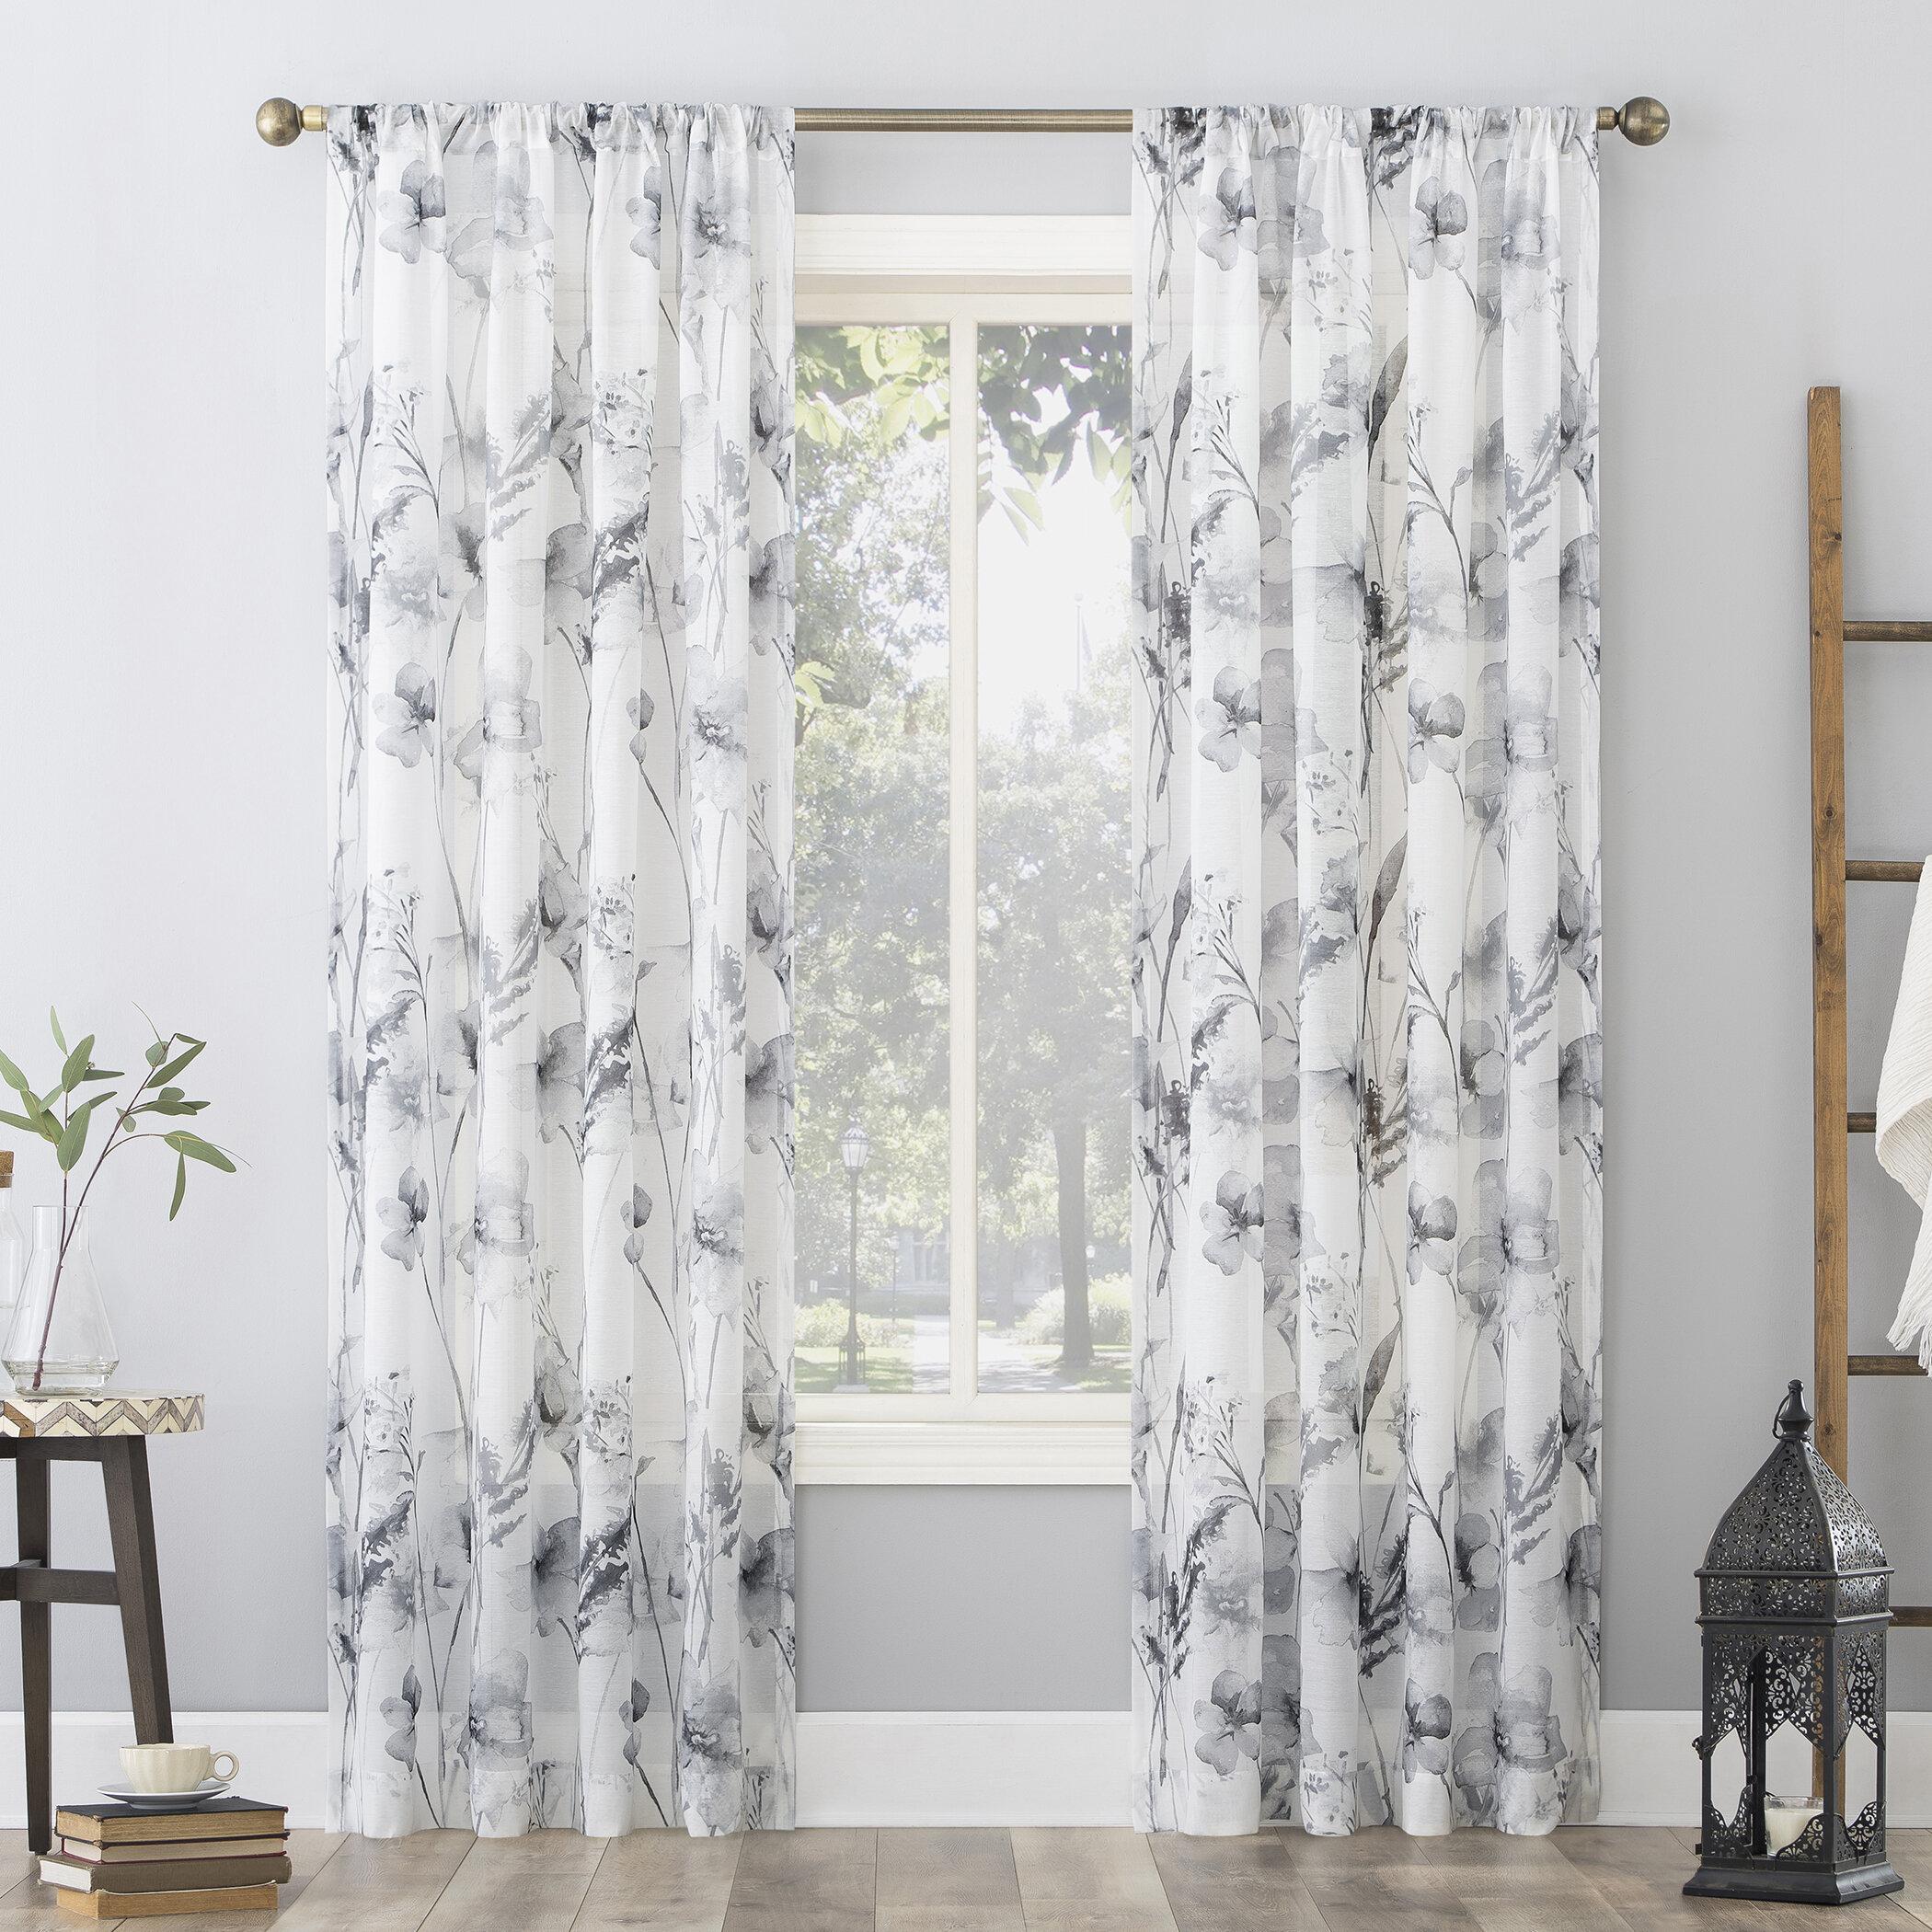 Red Barrel Studio Eryne Floral Sheer Rod Pocket Single Curtain Panel Reviews Wayfair